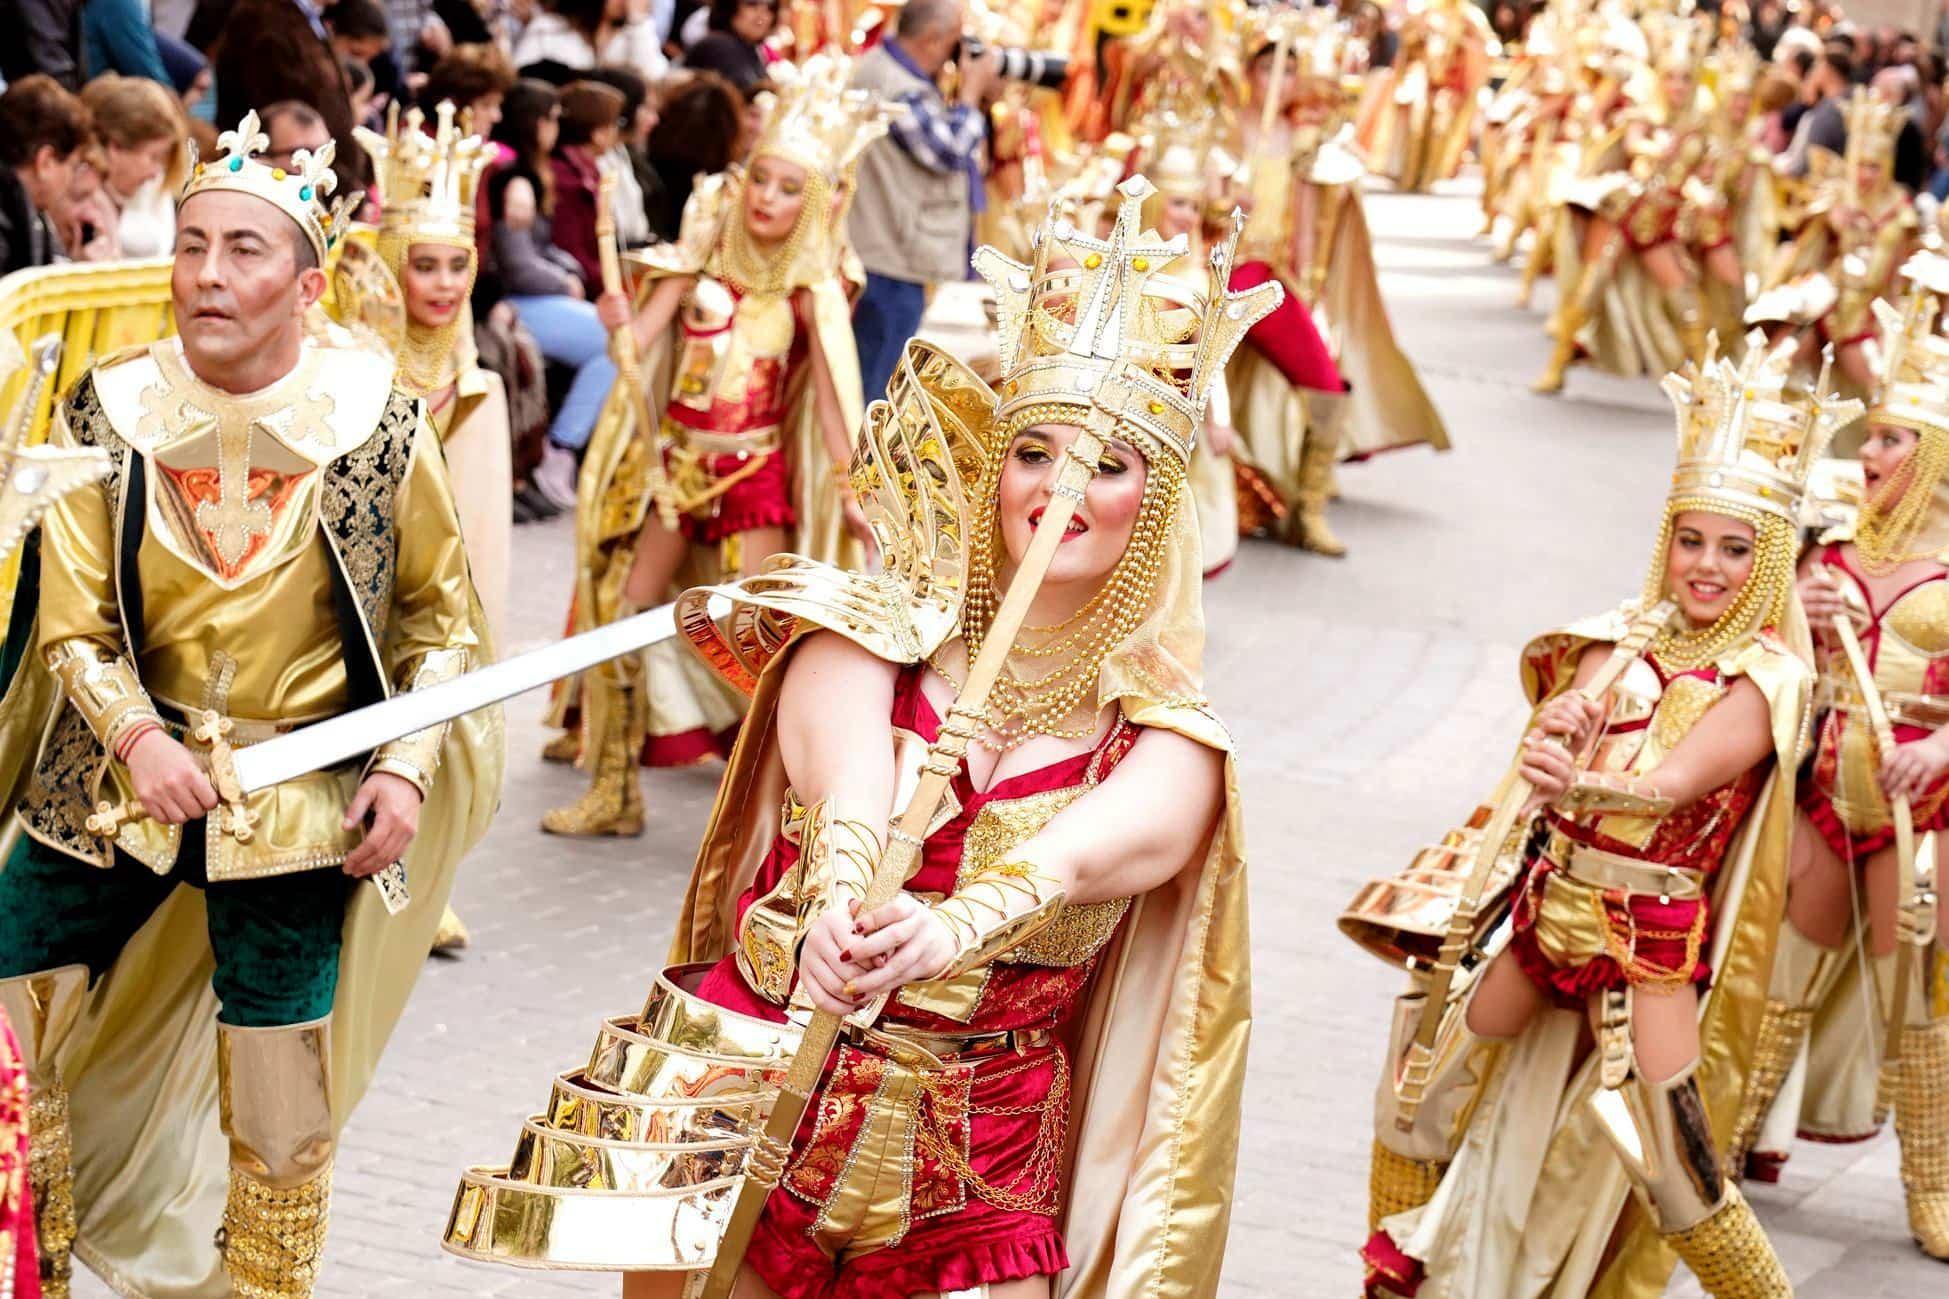 Carnaval de herencia 2020 ofertorio 41 - Selección de fotografías del Ofertorio del Carnaval de Herencia